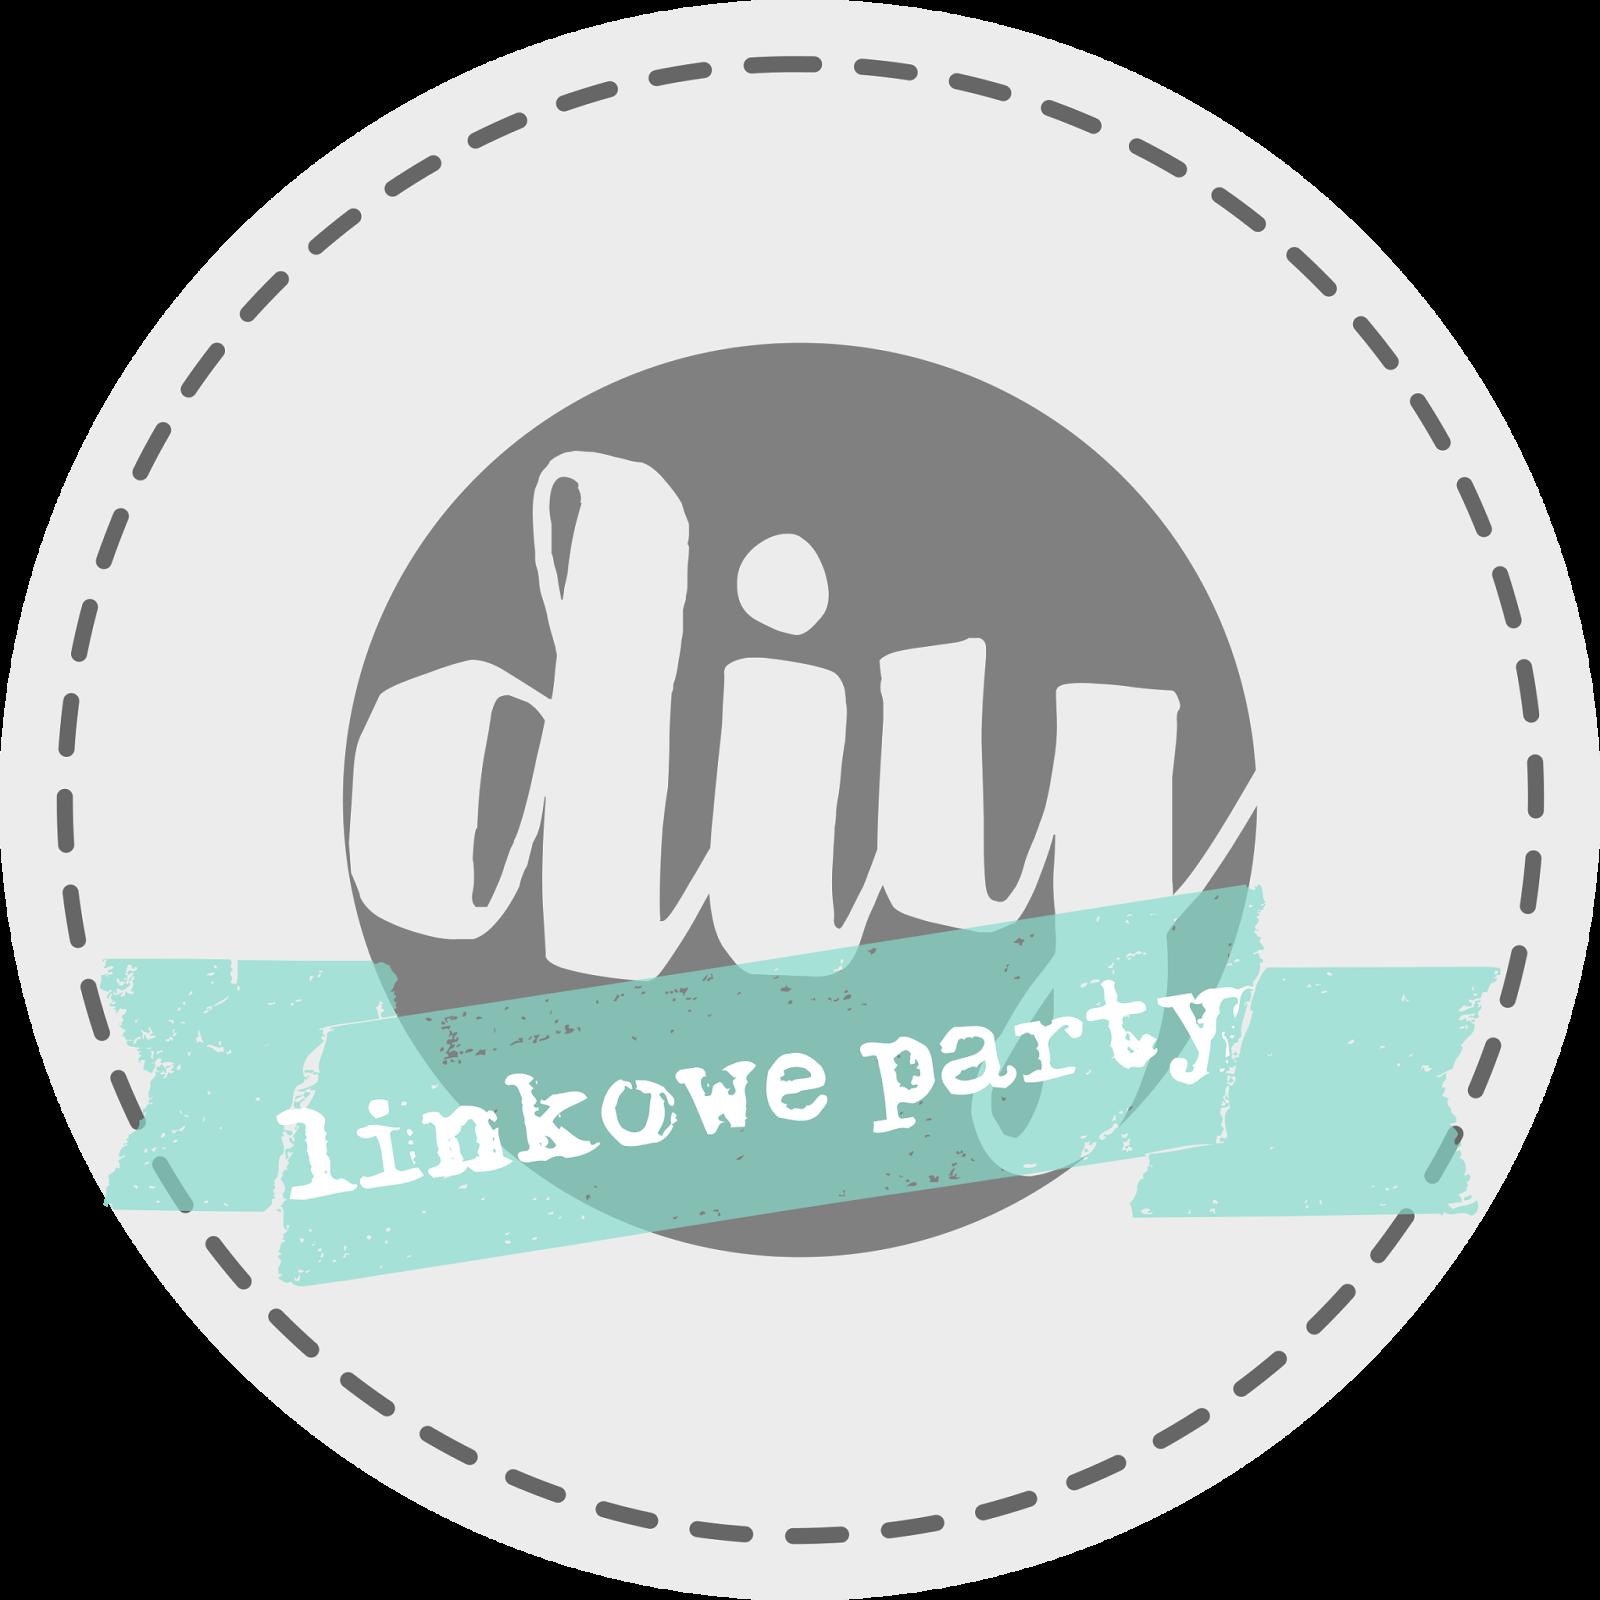 https://4.bp.blogspot.com/-UGYm4wm1nQY/V9NKRVnFN0I/AAAAAAAACsw/t4Jfs01LXLwxbjVL75INk3EreuyhusBhQCLcB/s1600/diy_linkowe_party_logo.png